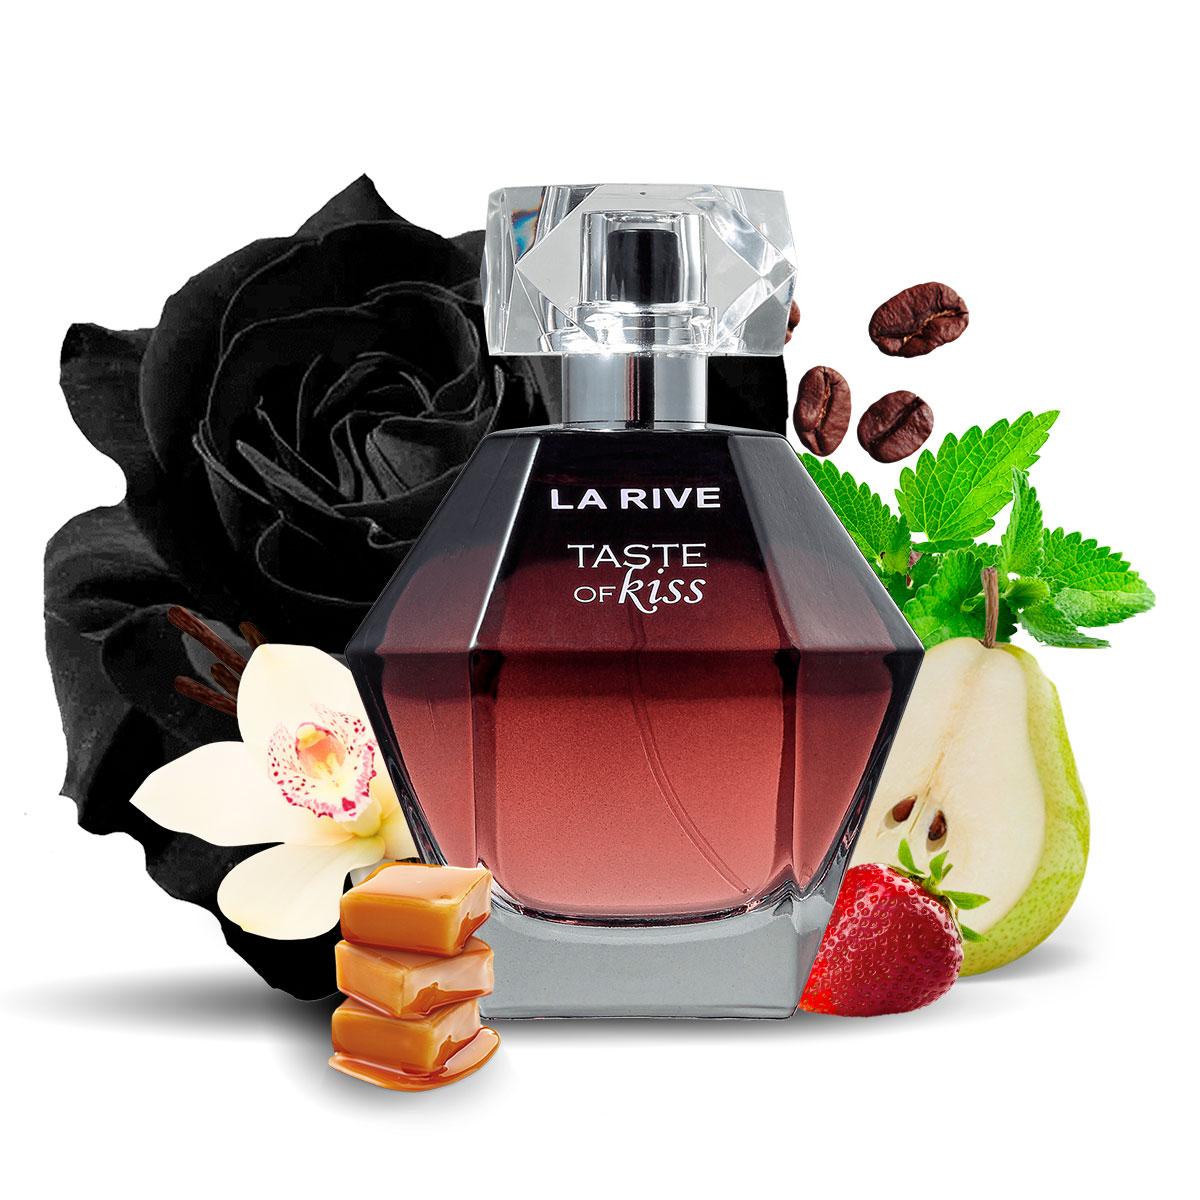 Kit 2 Perfumes Importados Taste of Kiss, Lexcellente La Rive